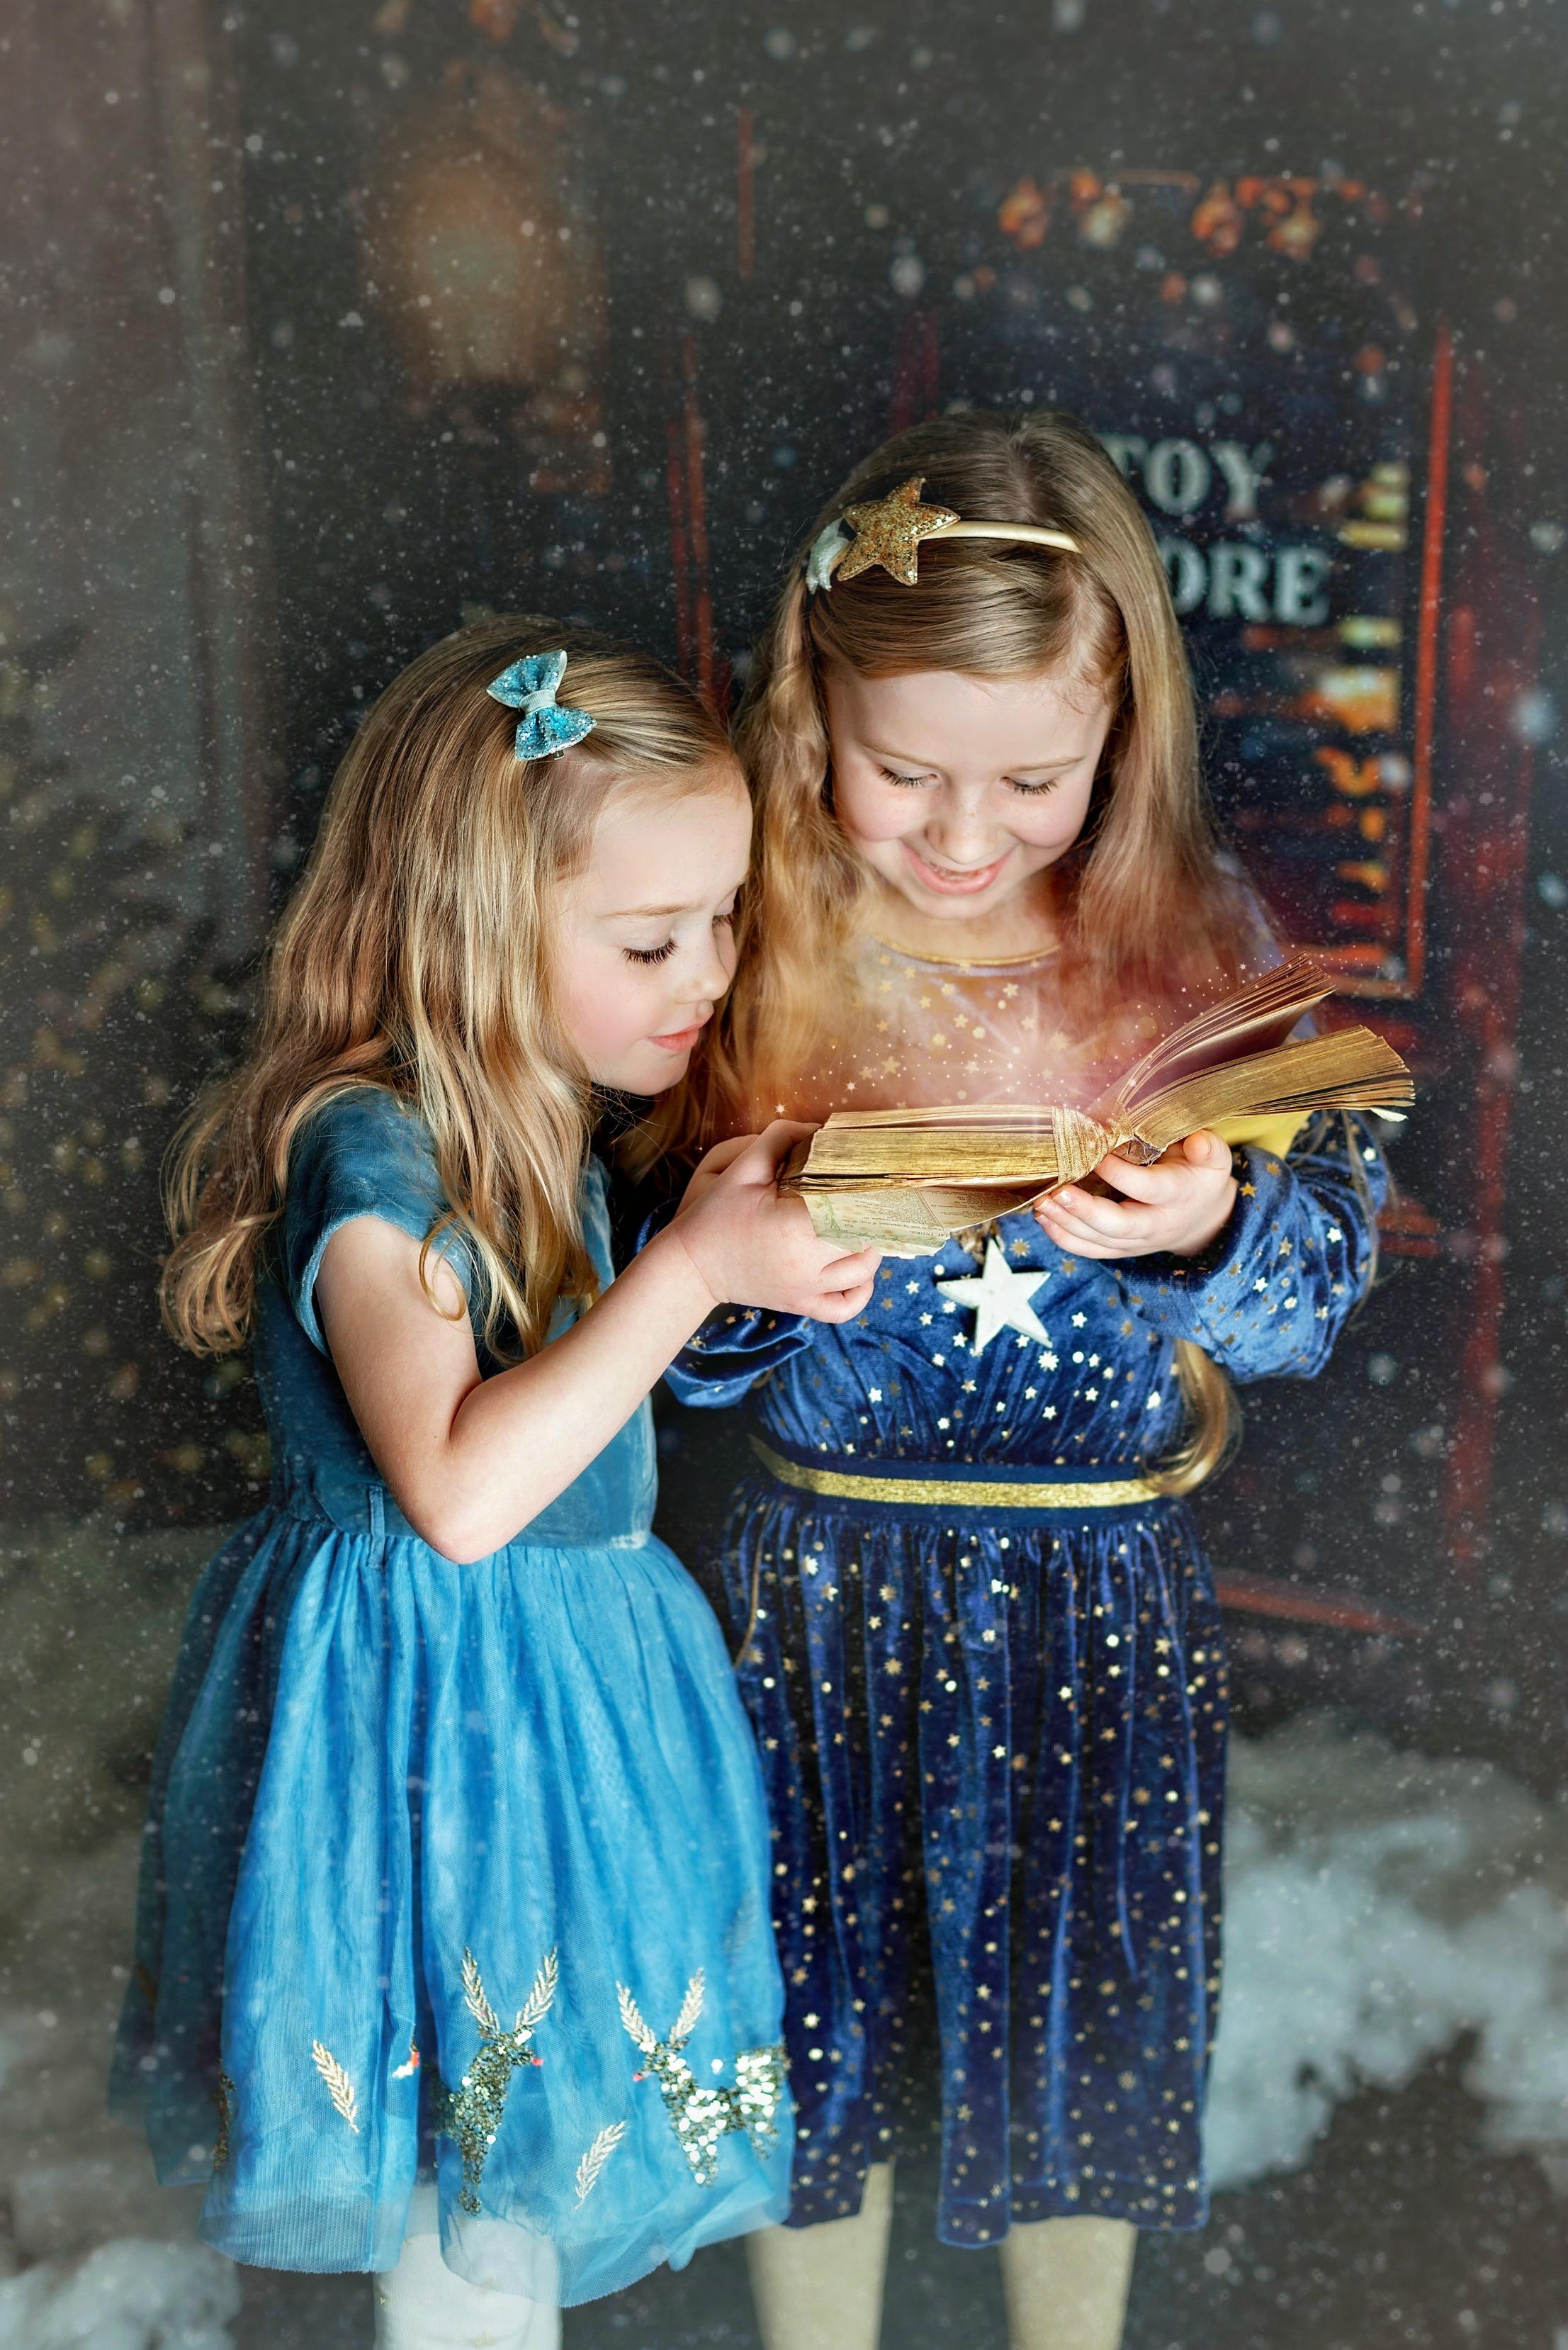 siblings Christmas photos